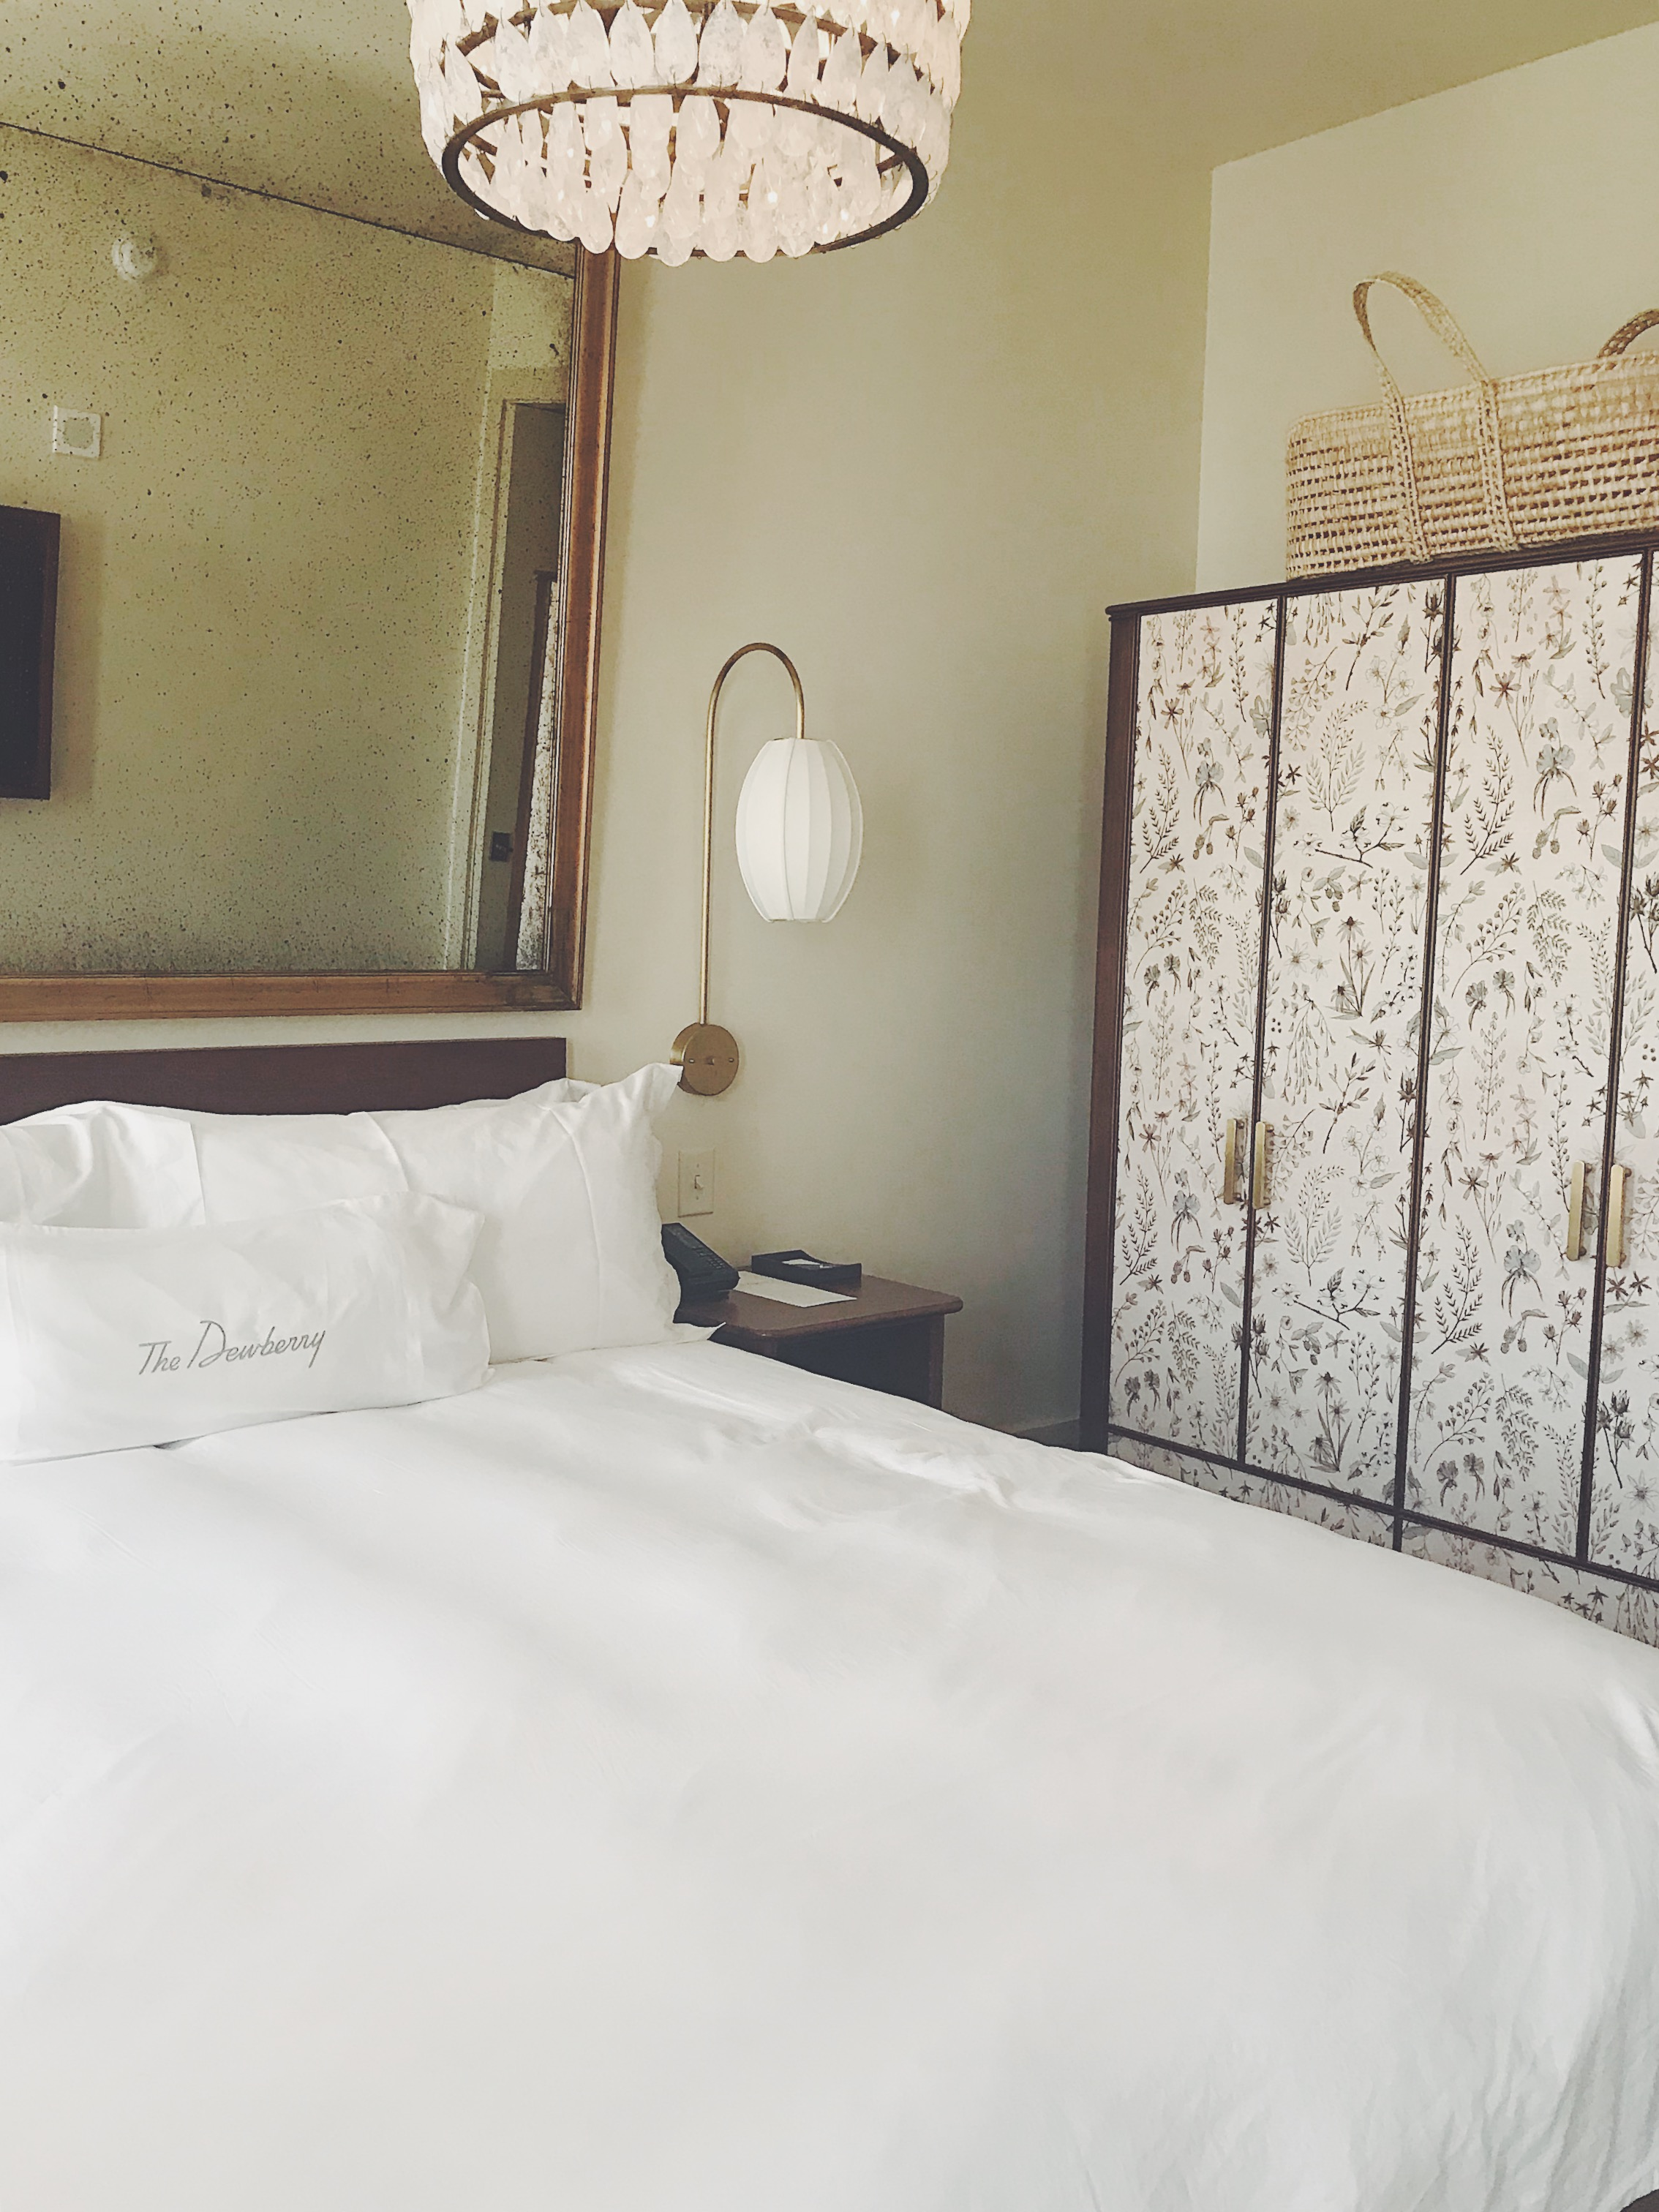 dewberry hotel room